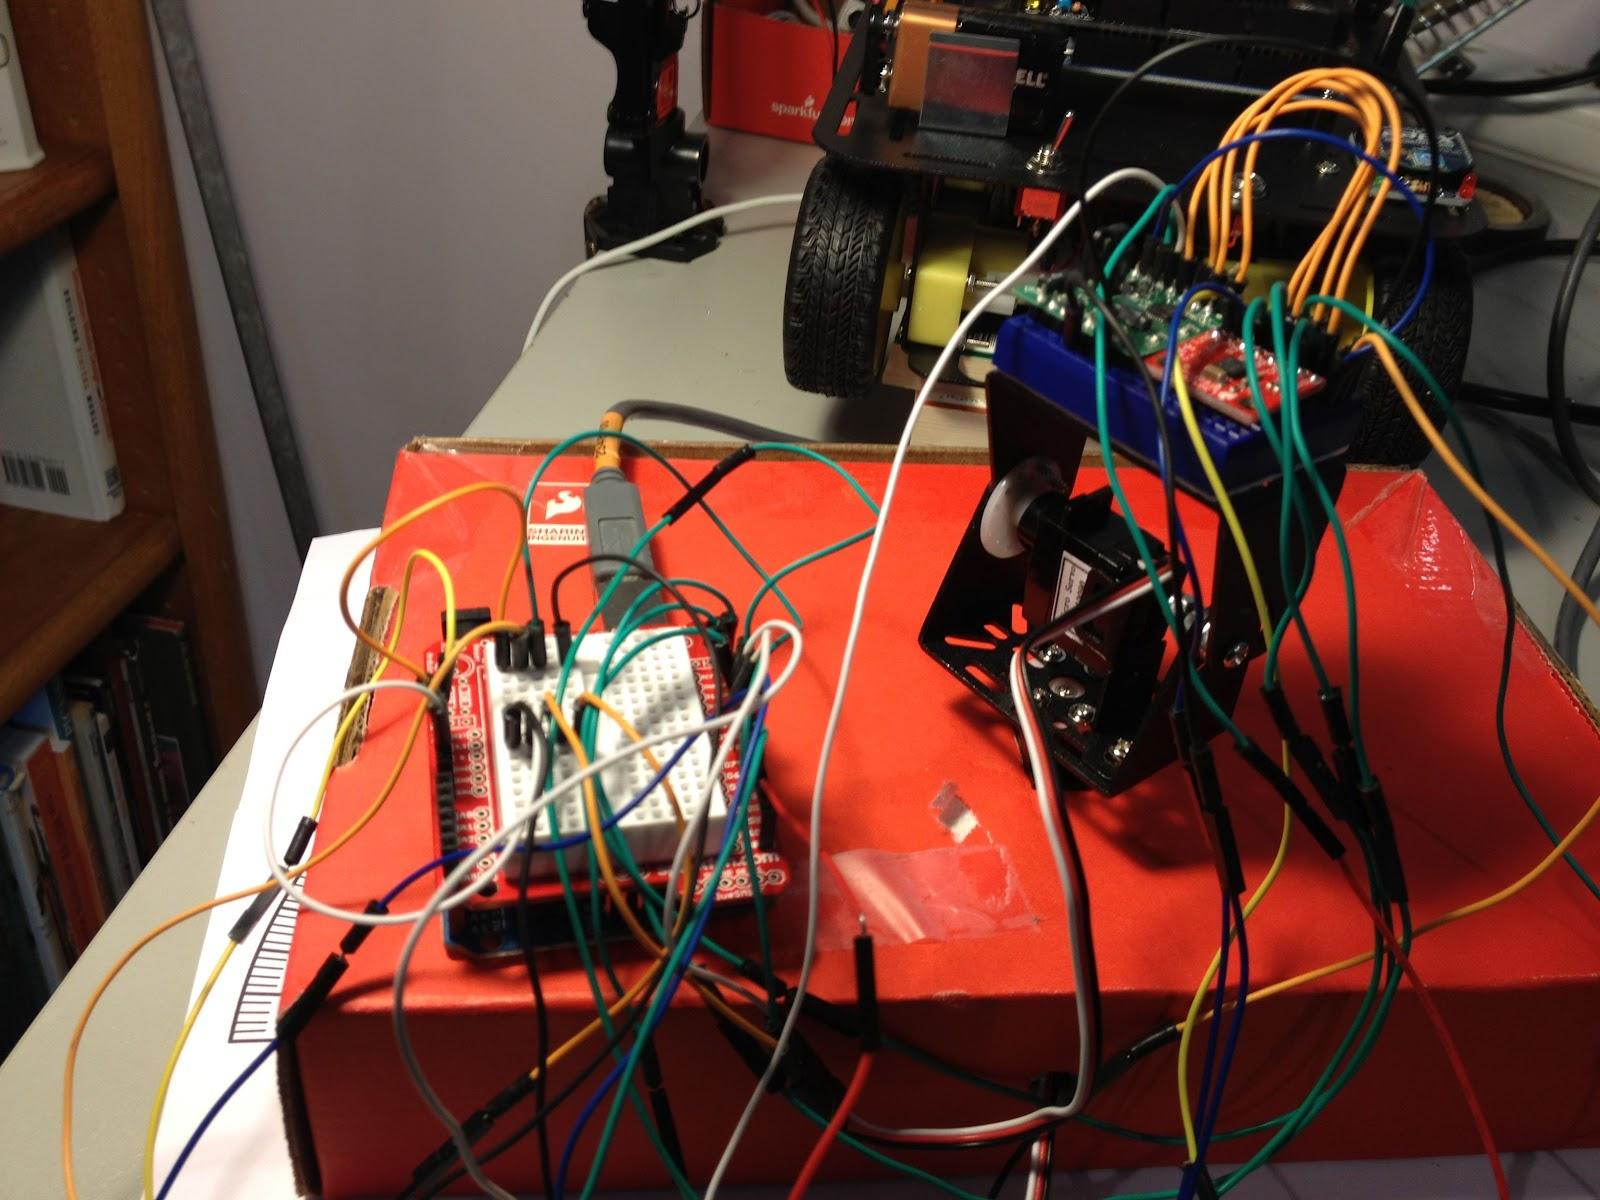 Accelerometer, Gyroscope and IMU Sensors Tutorials